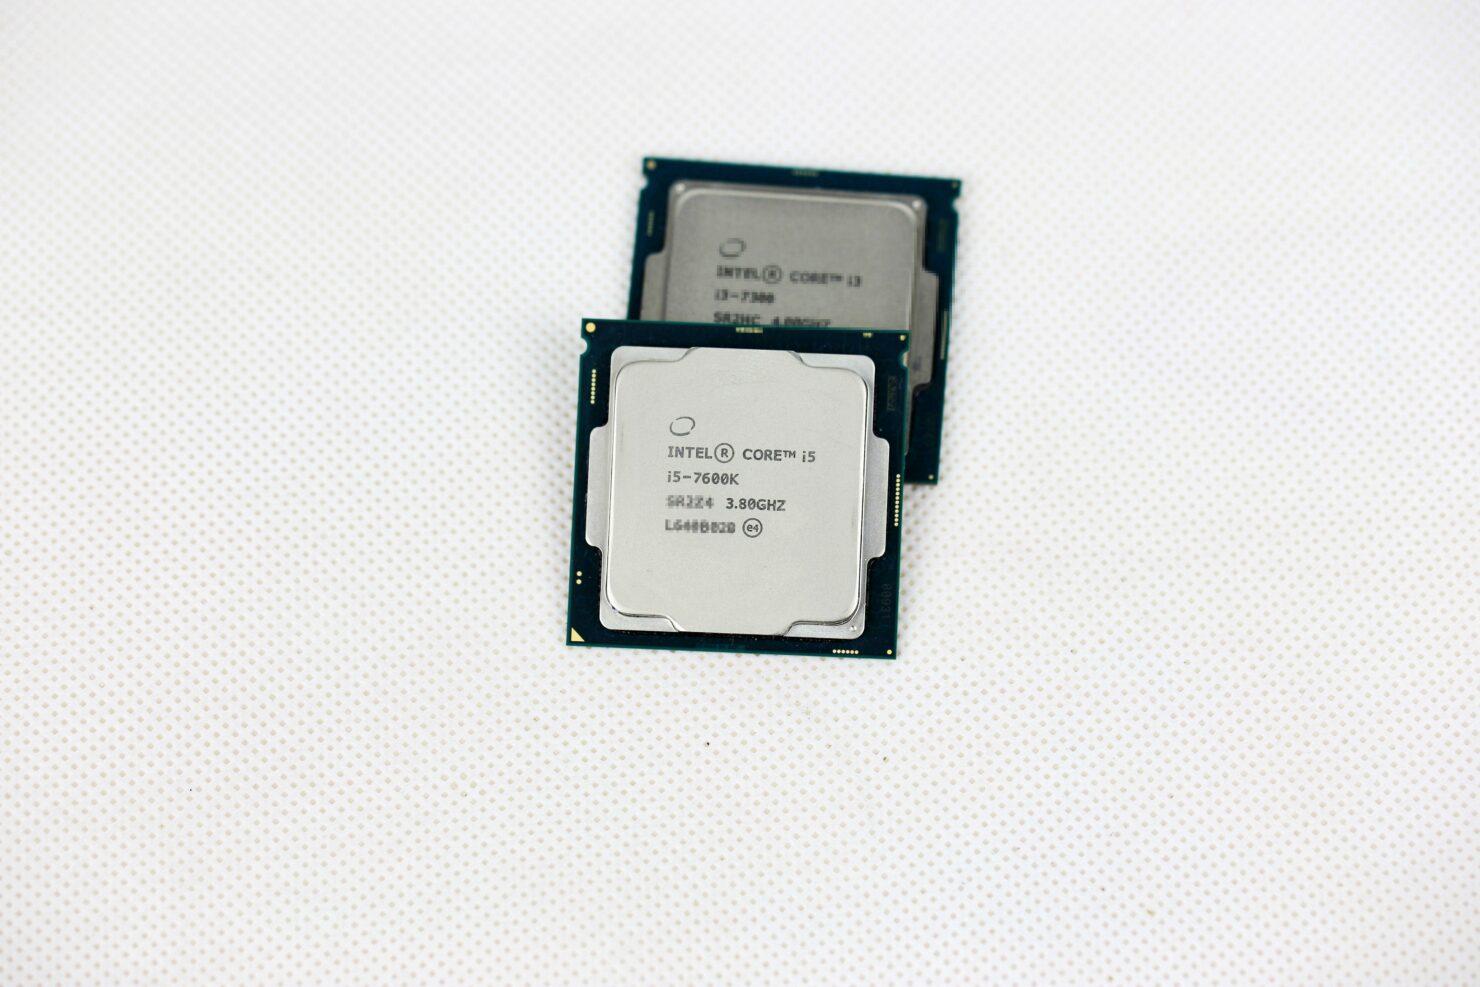 intel-core-i5-7600k_pconline_1